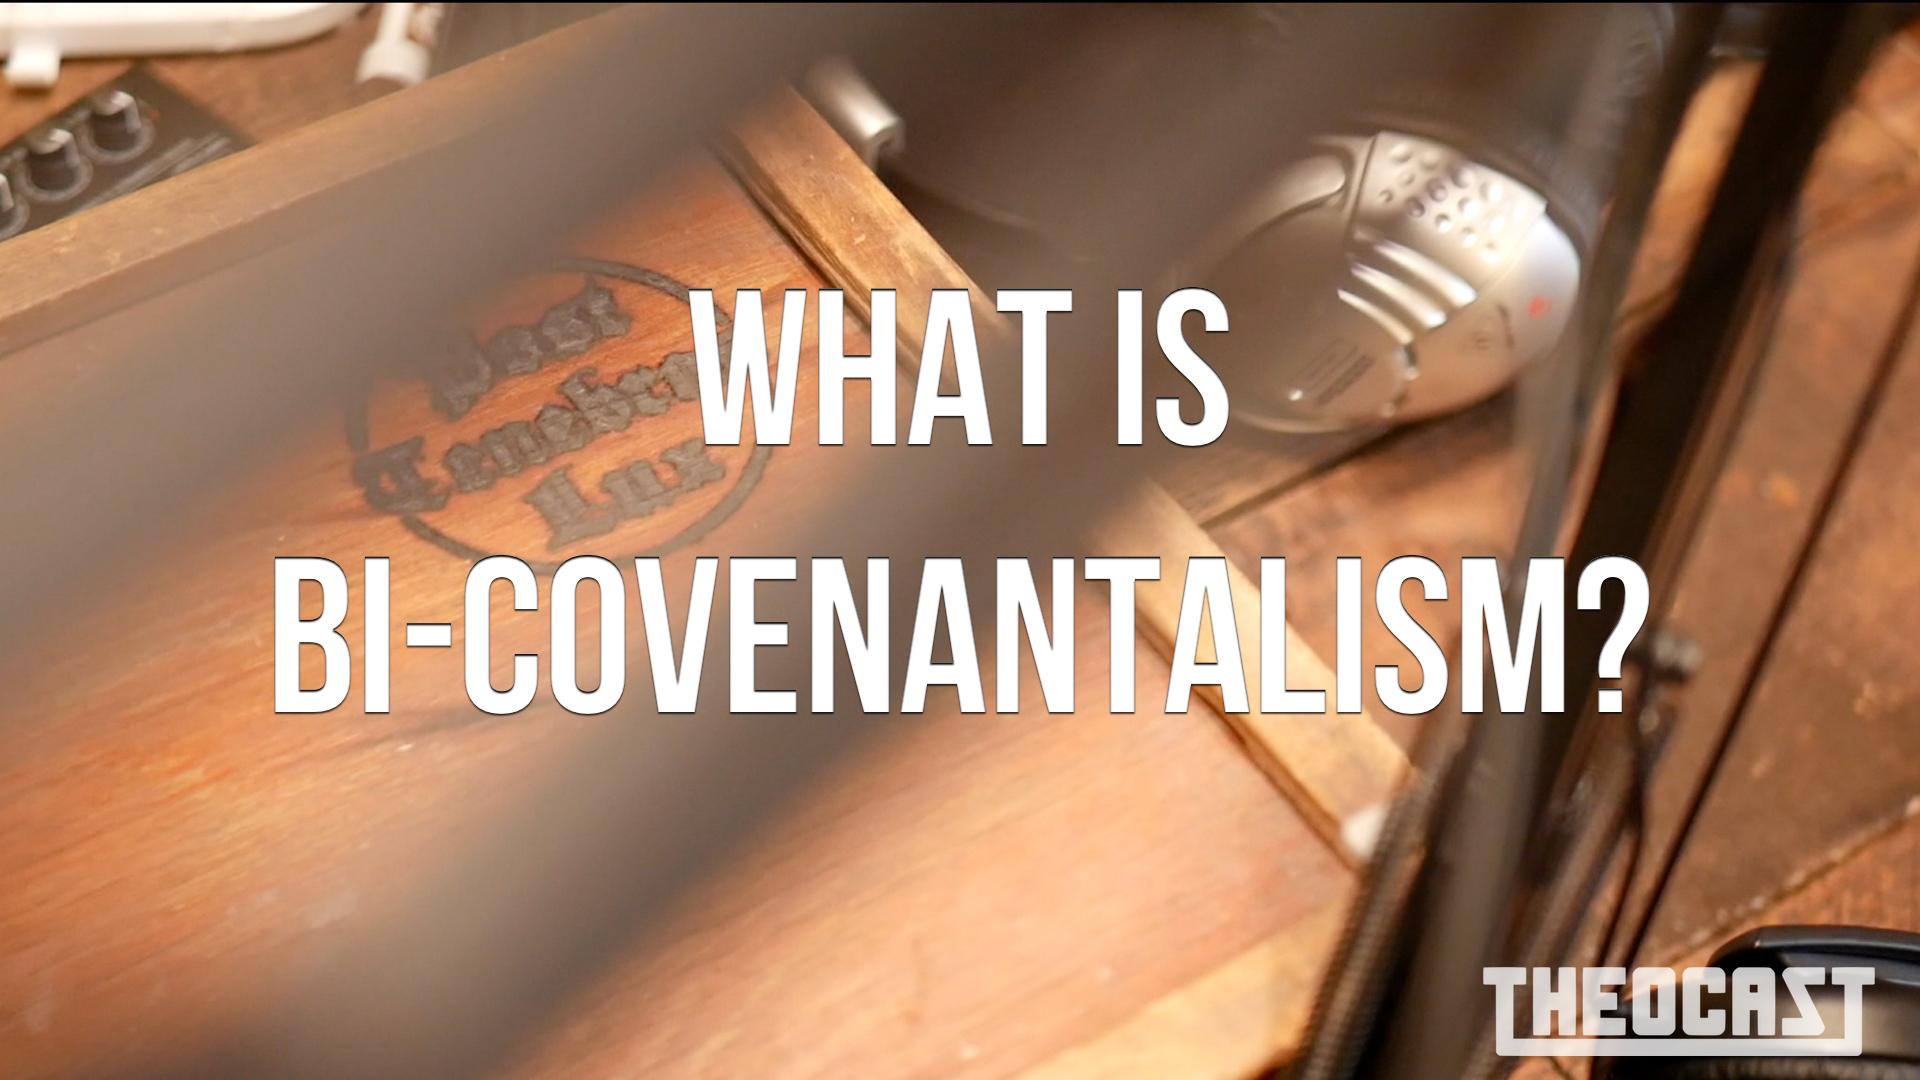 What is bi-covenantalism?